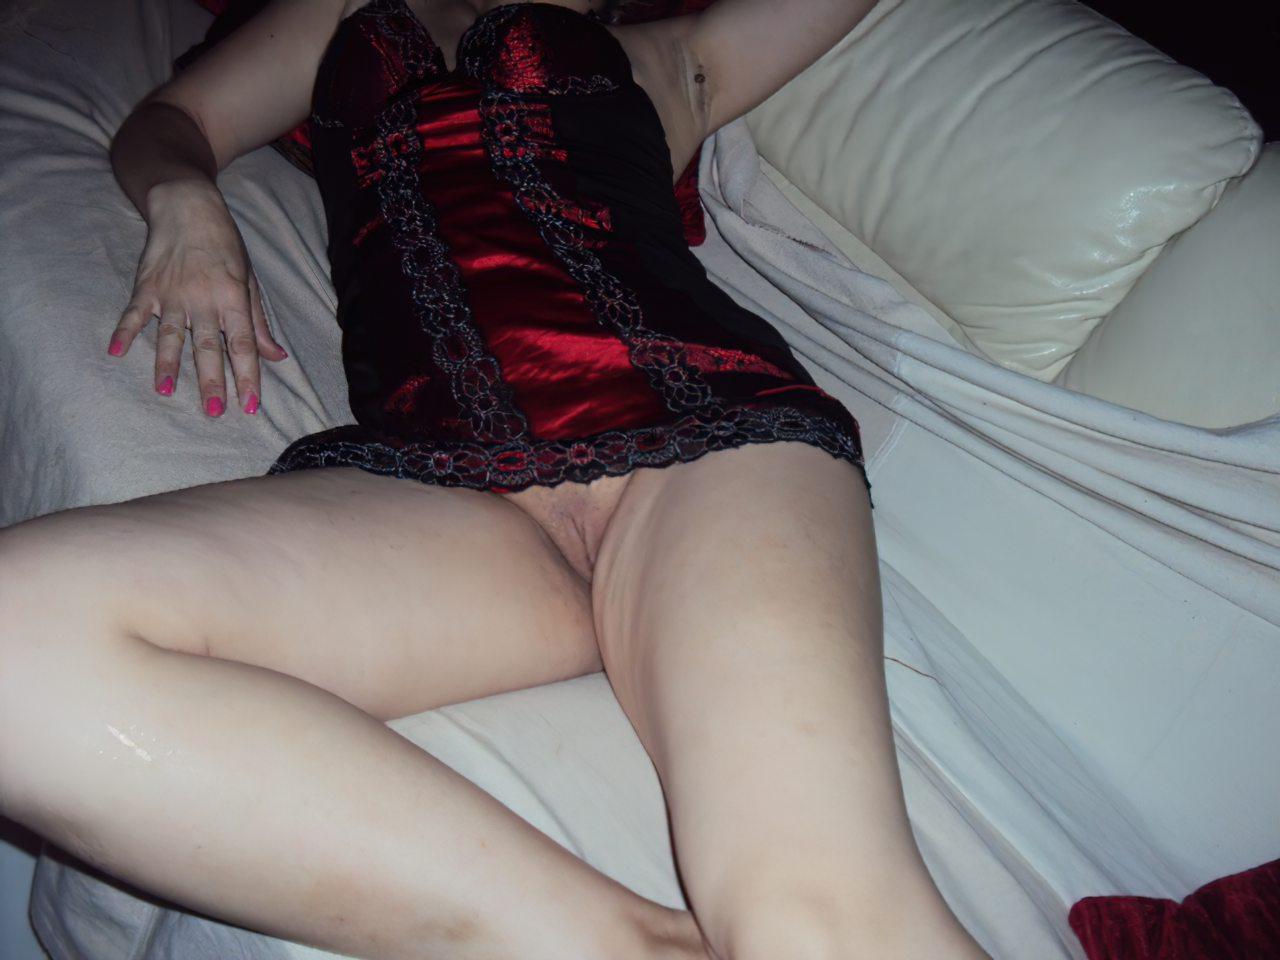 Esposa se Mostrando (19)